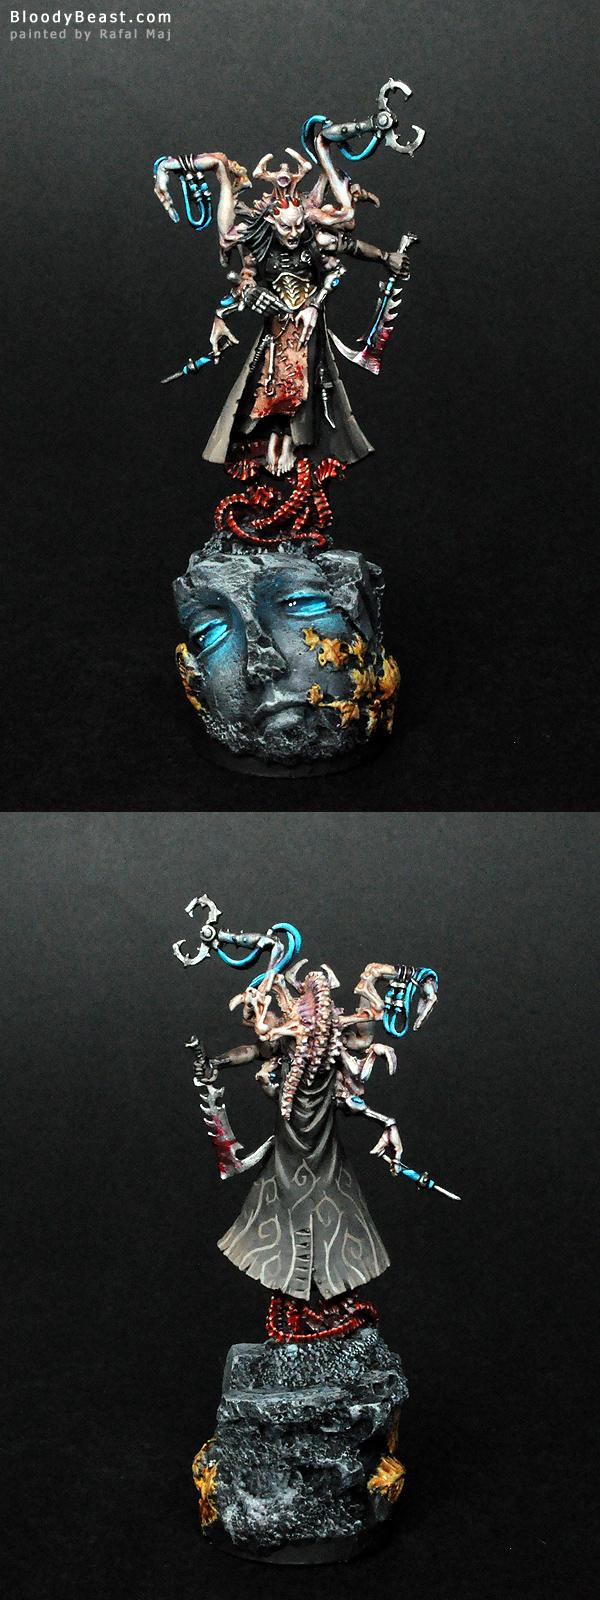 Dark Eldar Urien Rakarth painted by Rafal Maj (BloodyBeast.com)